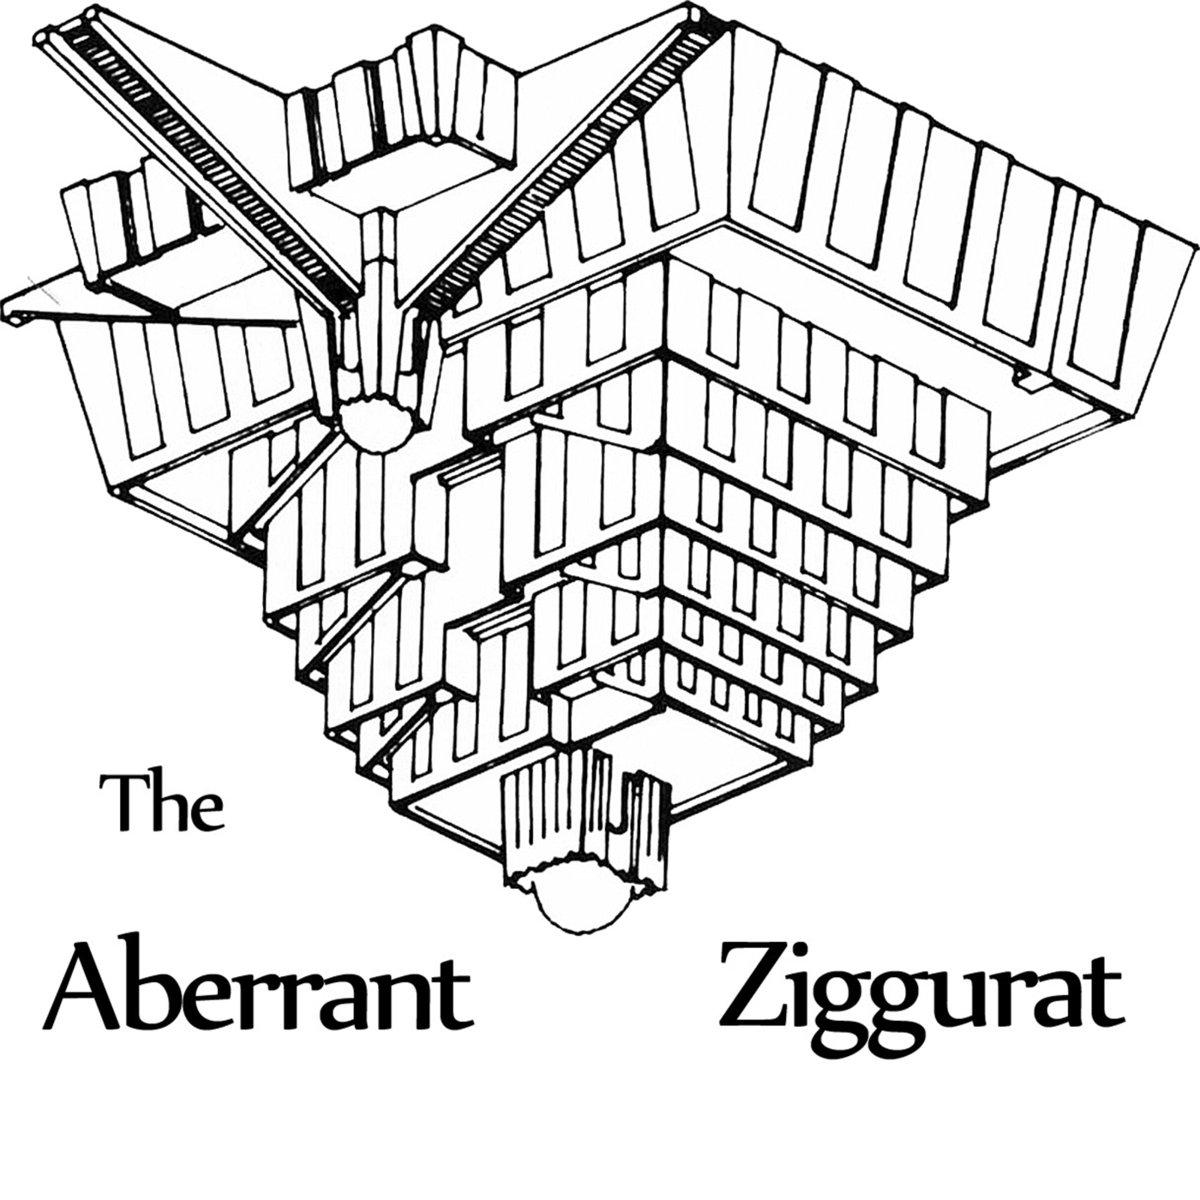 Ziggurat Drawing At Getdrawings